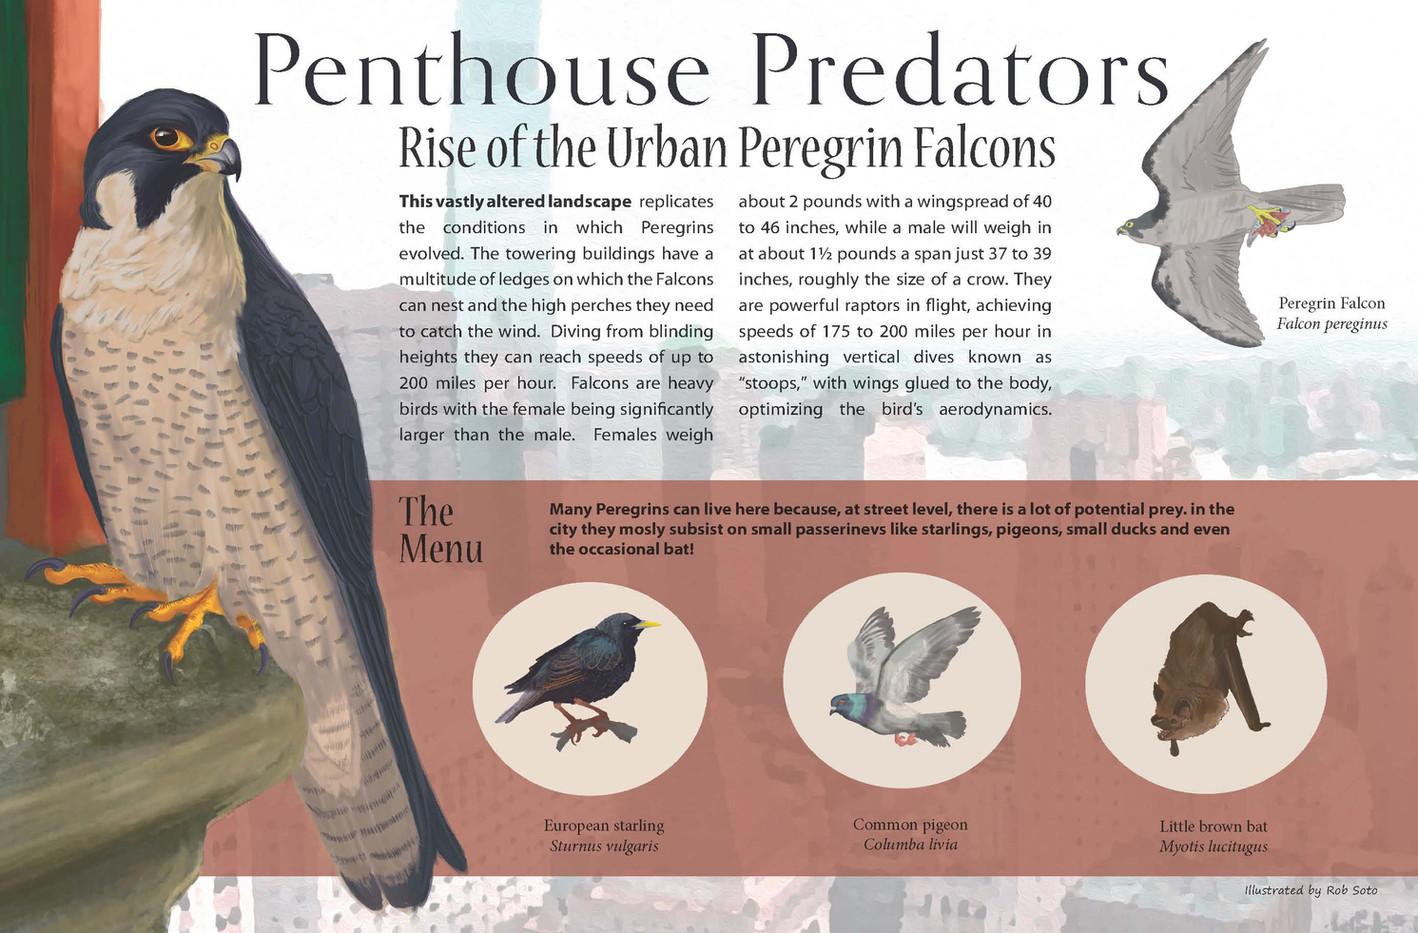 Penthouse Predators interp. panel